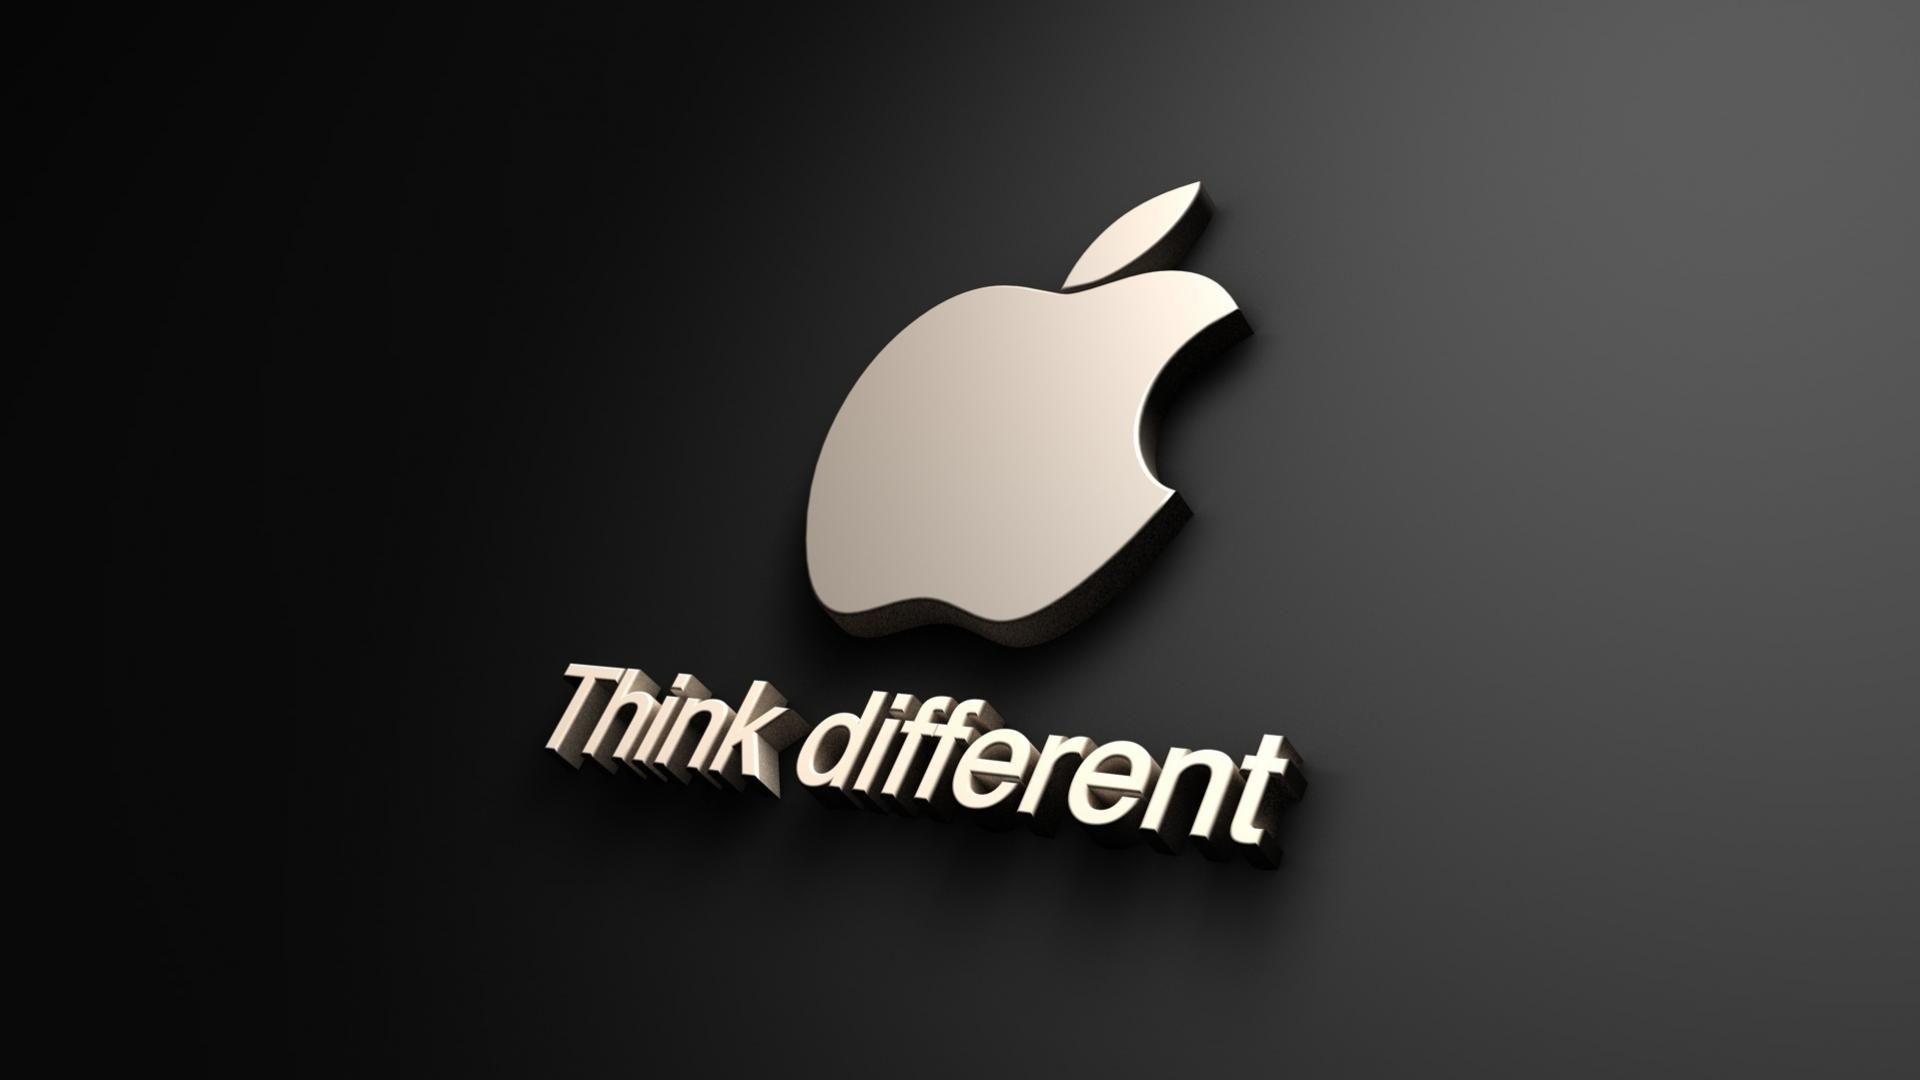 Hd wallpaper macbook - Logo Apple Hd Wallpaper